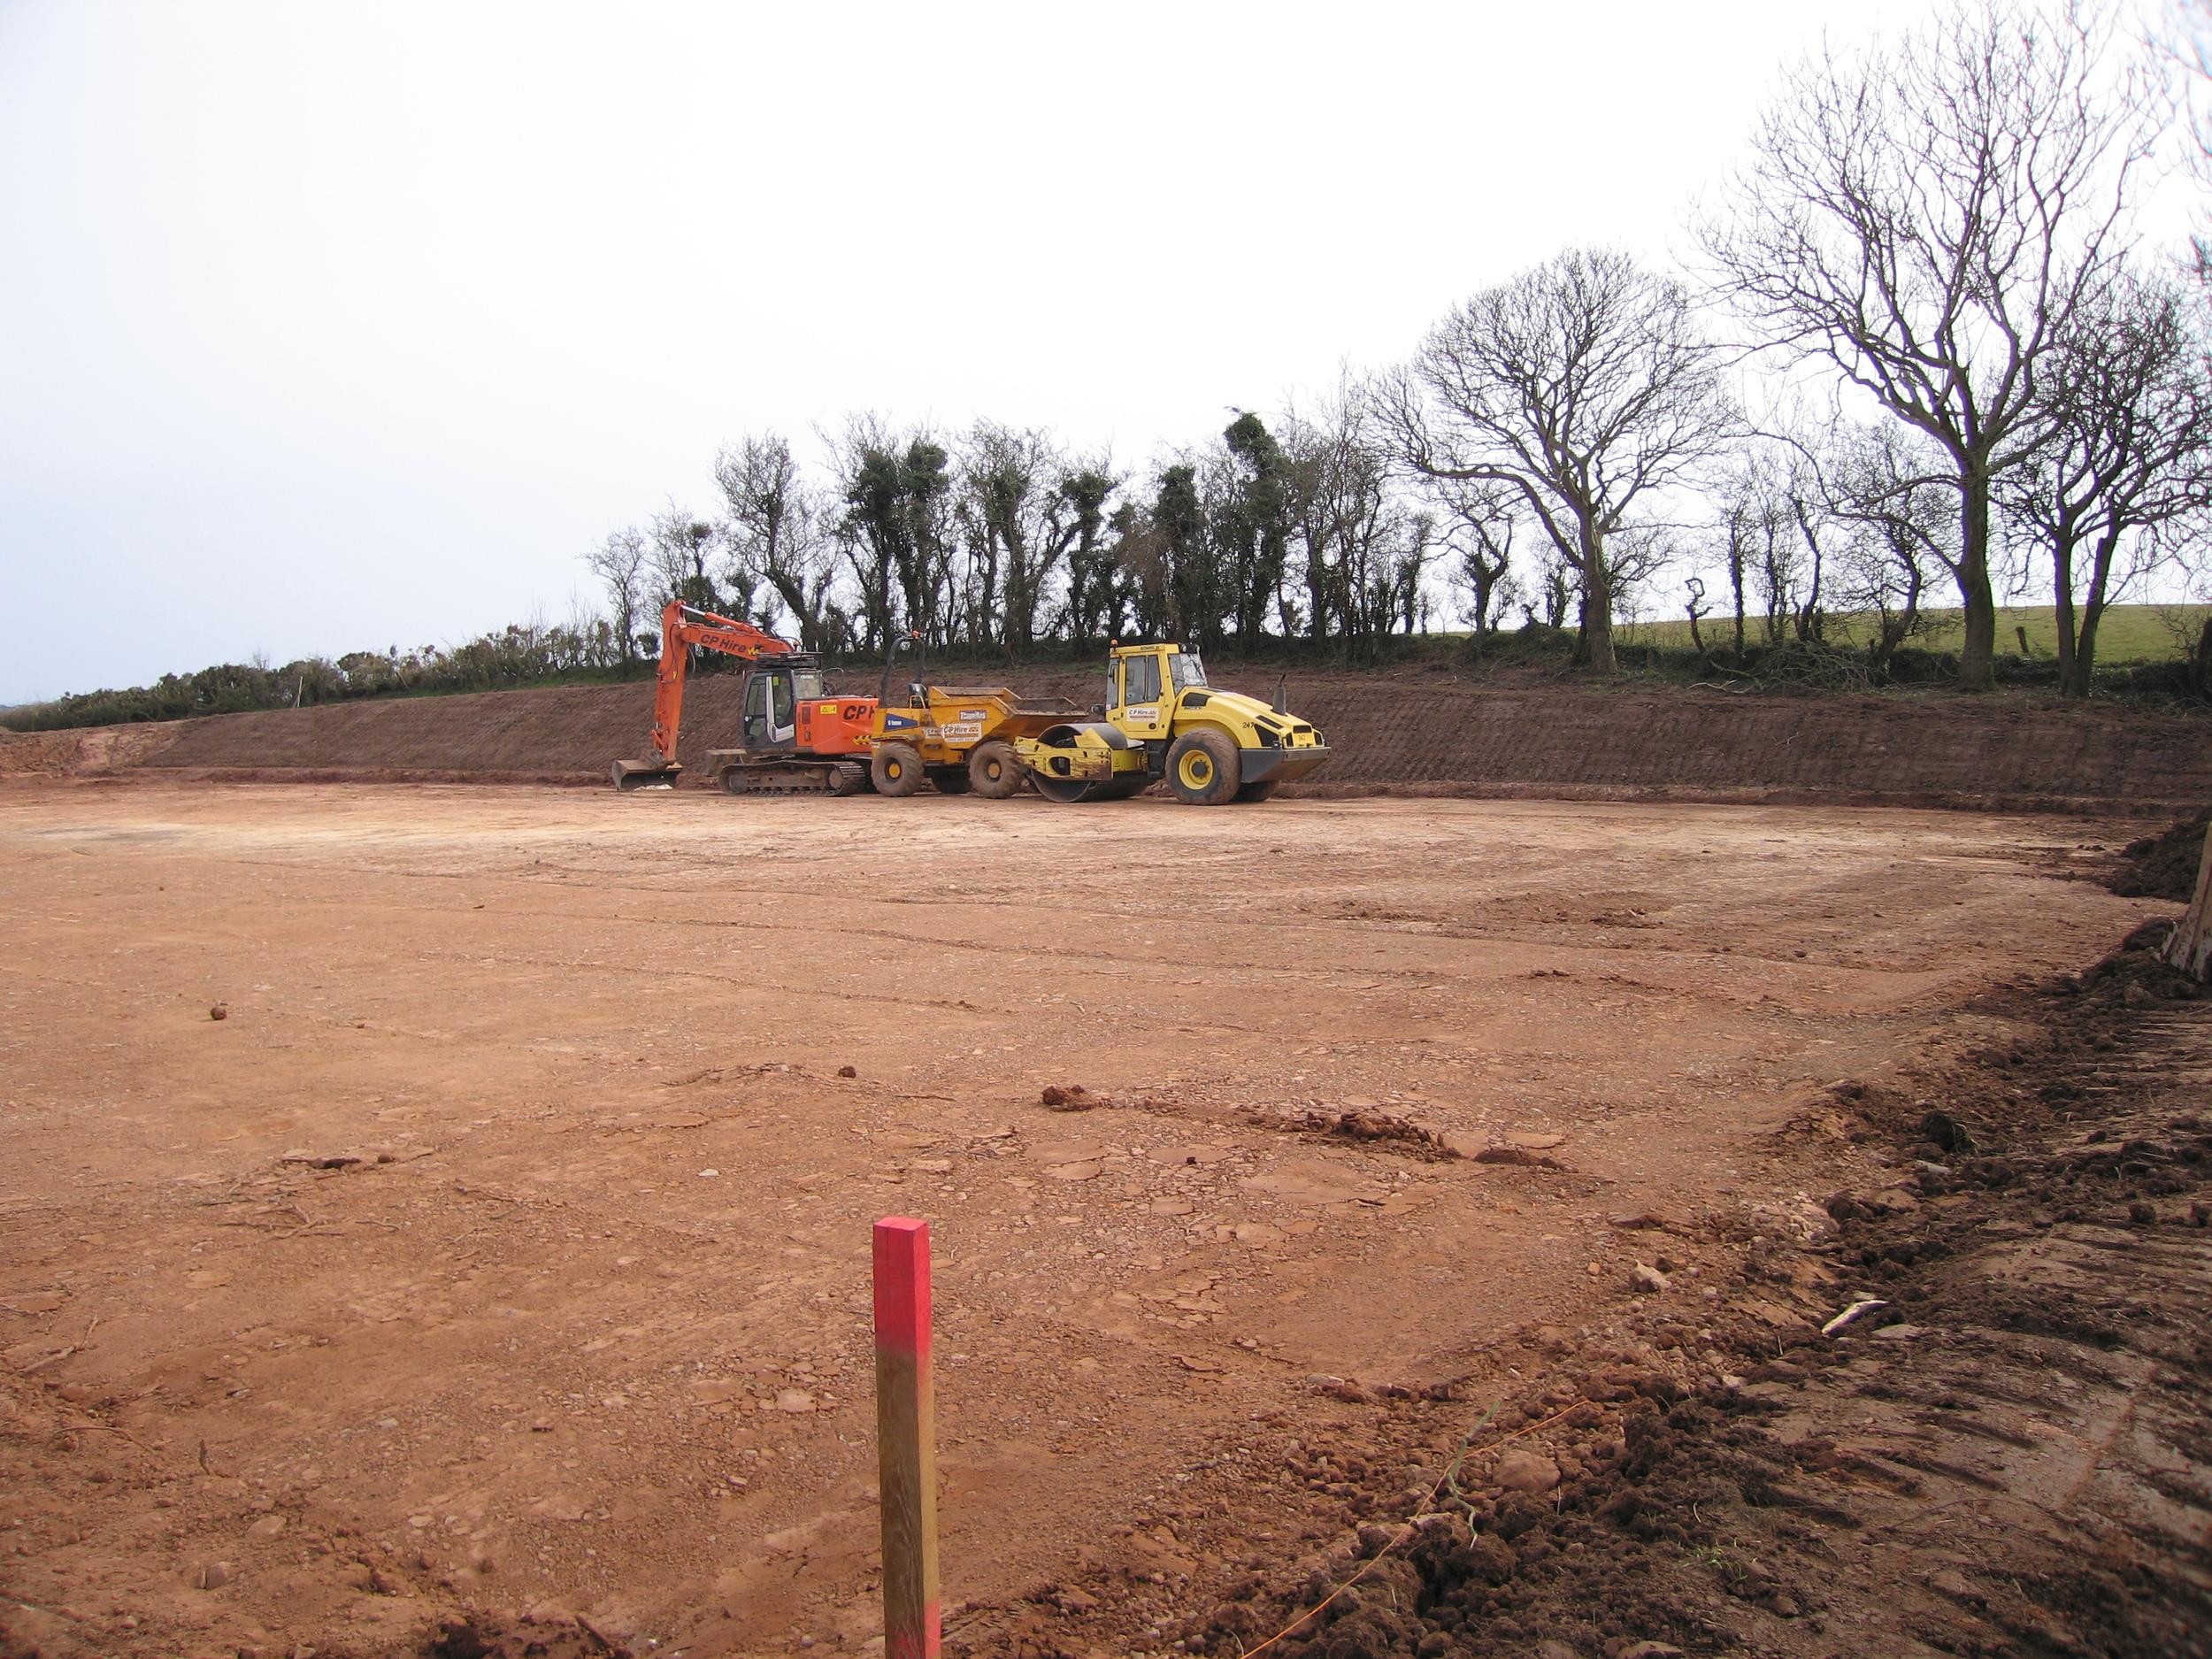 equestrian arena groundworks excavation ireland